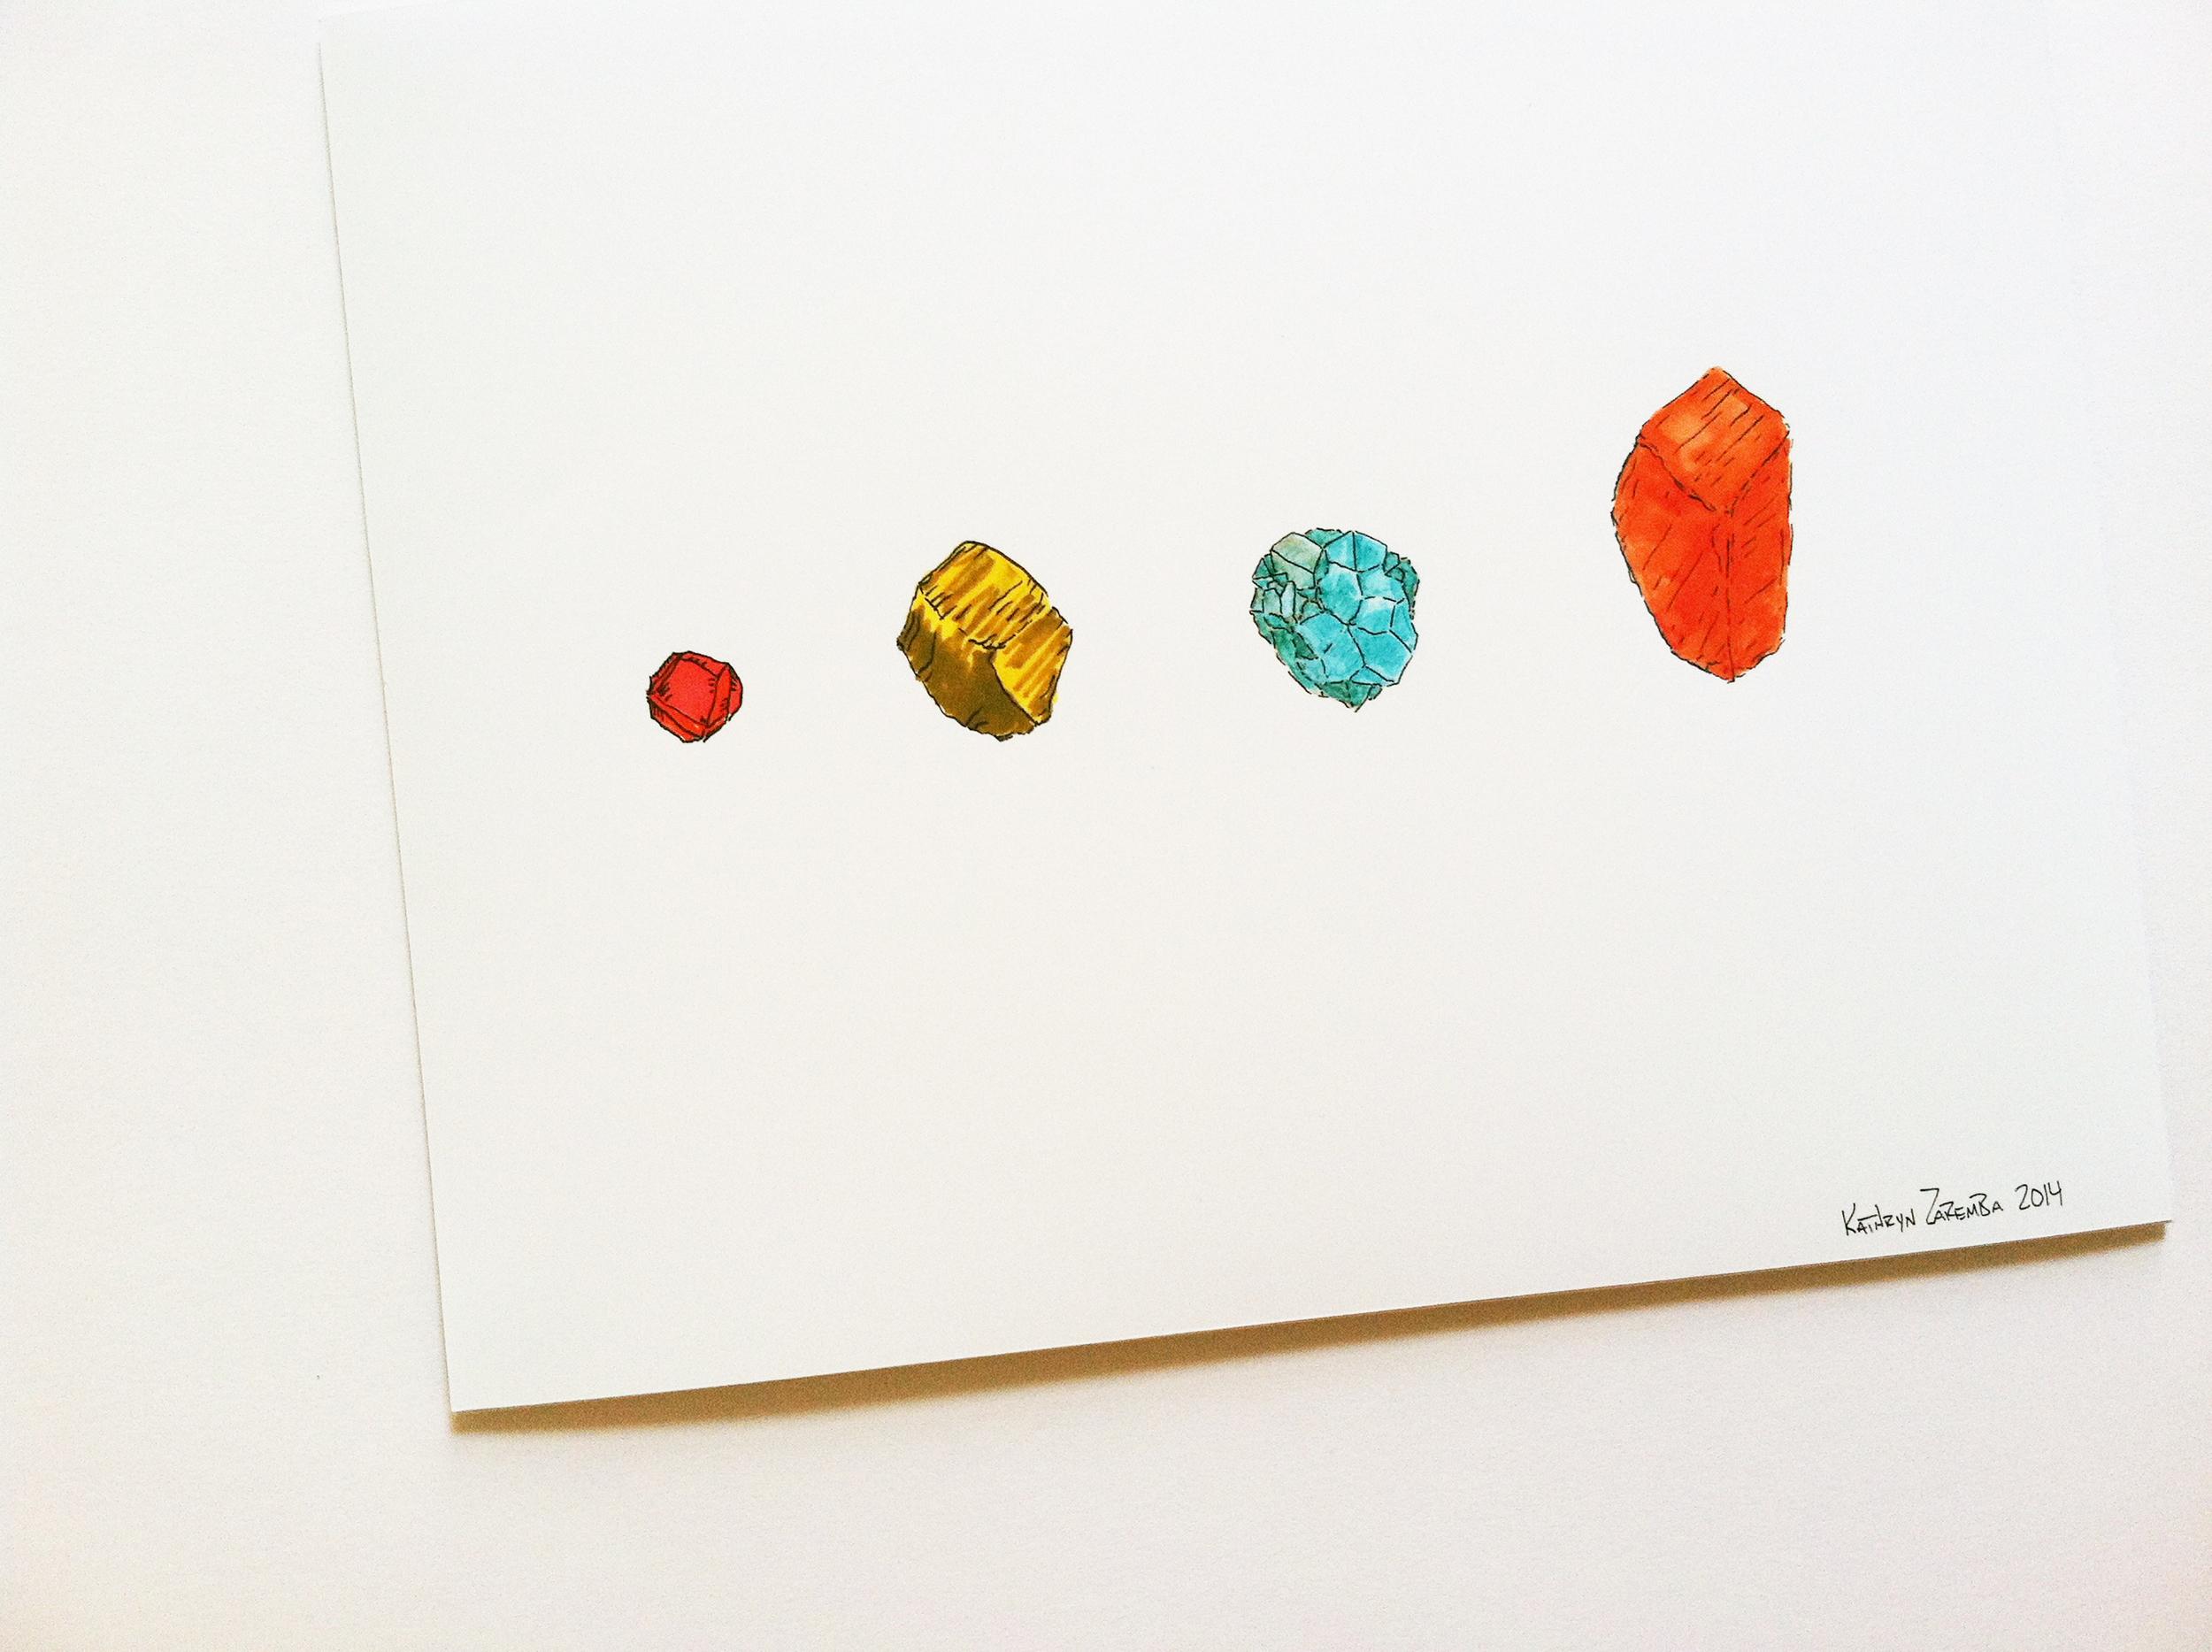 Gem Collection. 8X10, archival art print. Kathryn Zaremba 2014